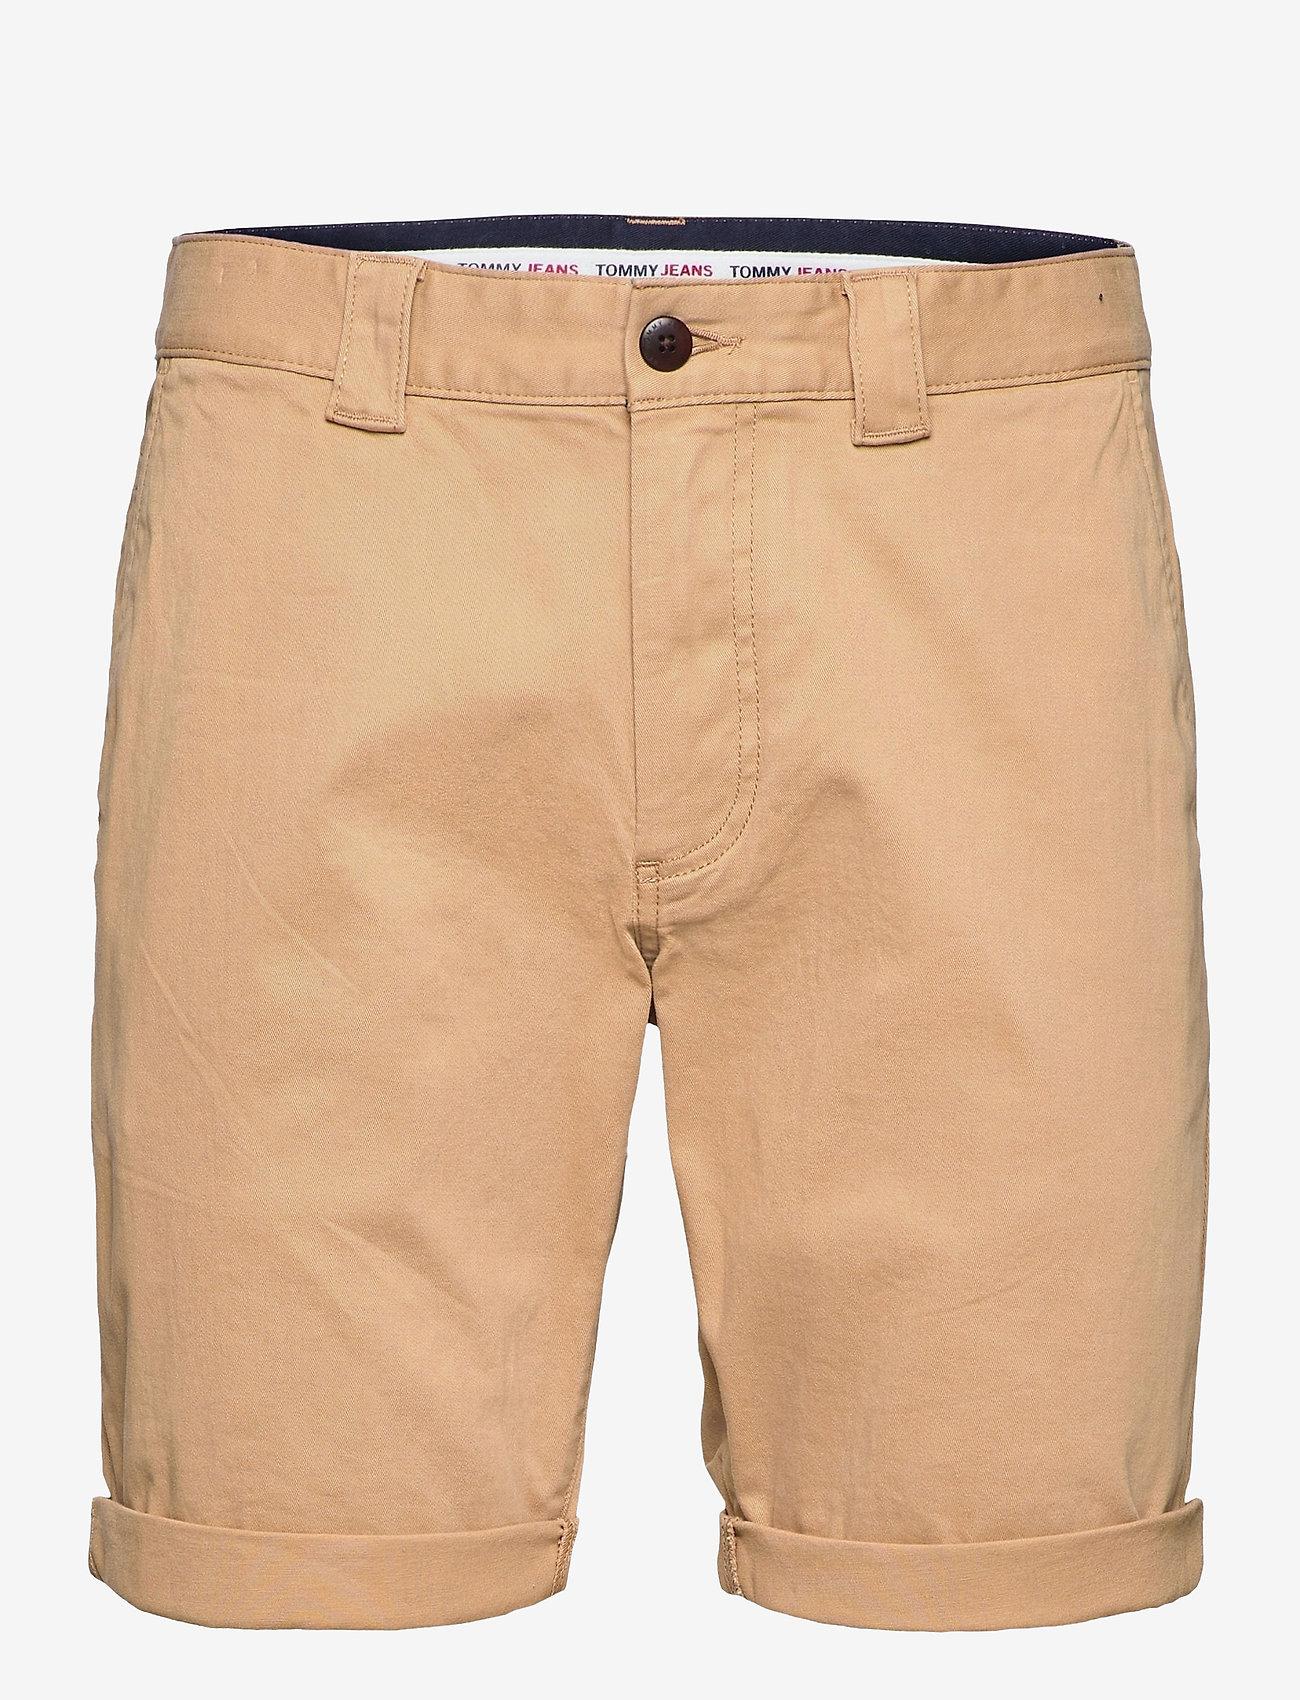 Tommy Jeans - TJM SCANTON CHINO SHORT - chinos shorts - classic khaki - 0